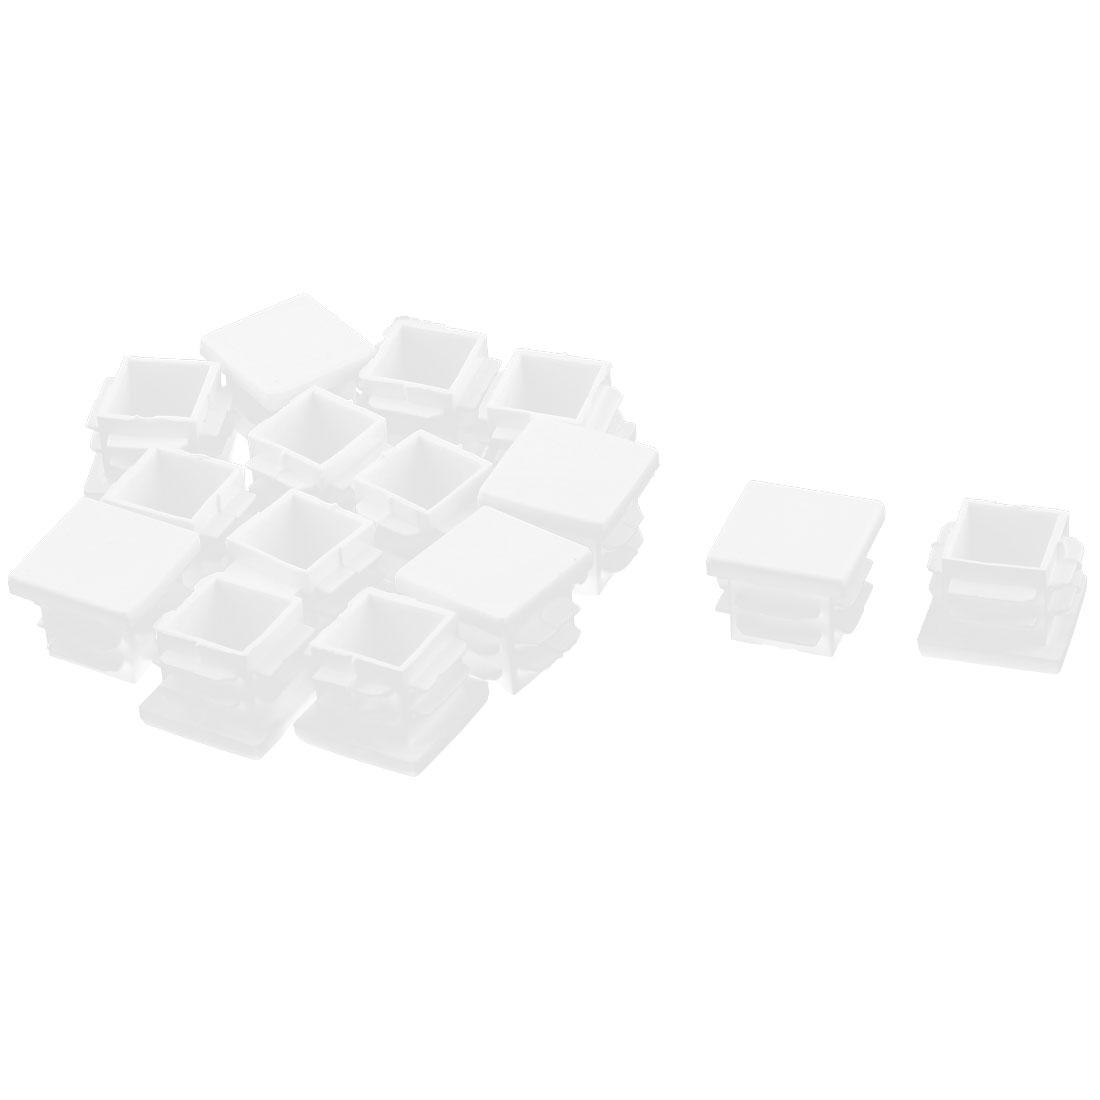 Plastic Square Furniture Foot Blanking Cap Insert White 19mm x 19mm 15pcs